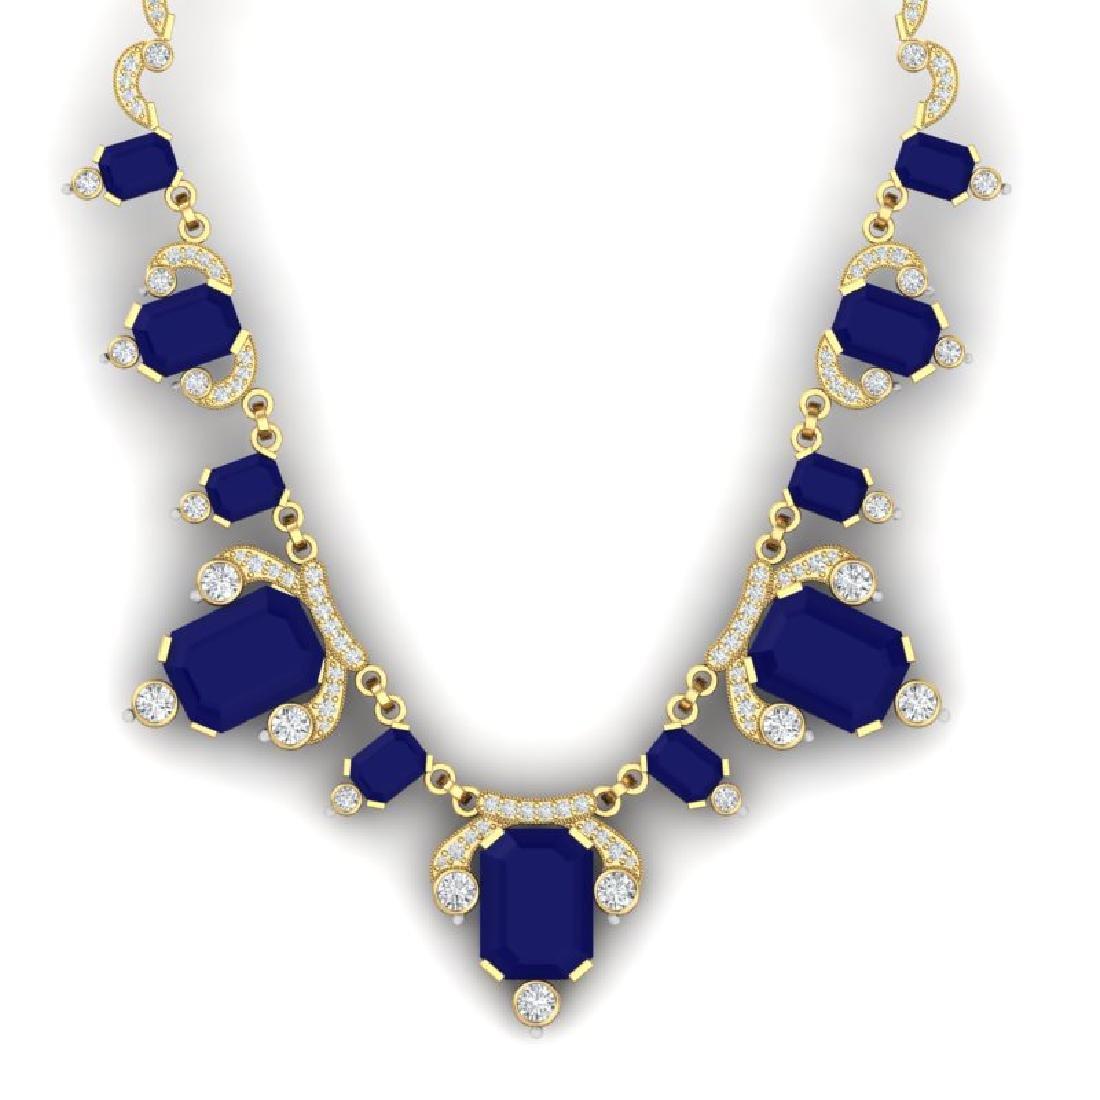 75.21 CTW Royalty Sapphire & VS Diamond Necklace 18K